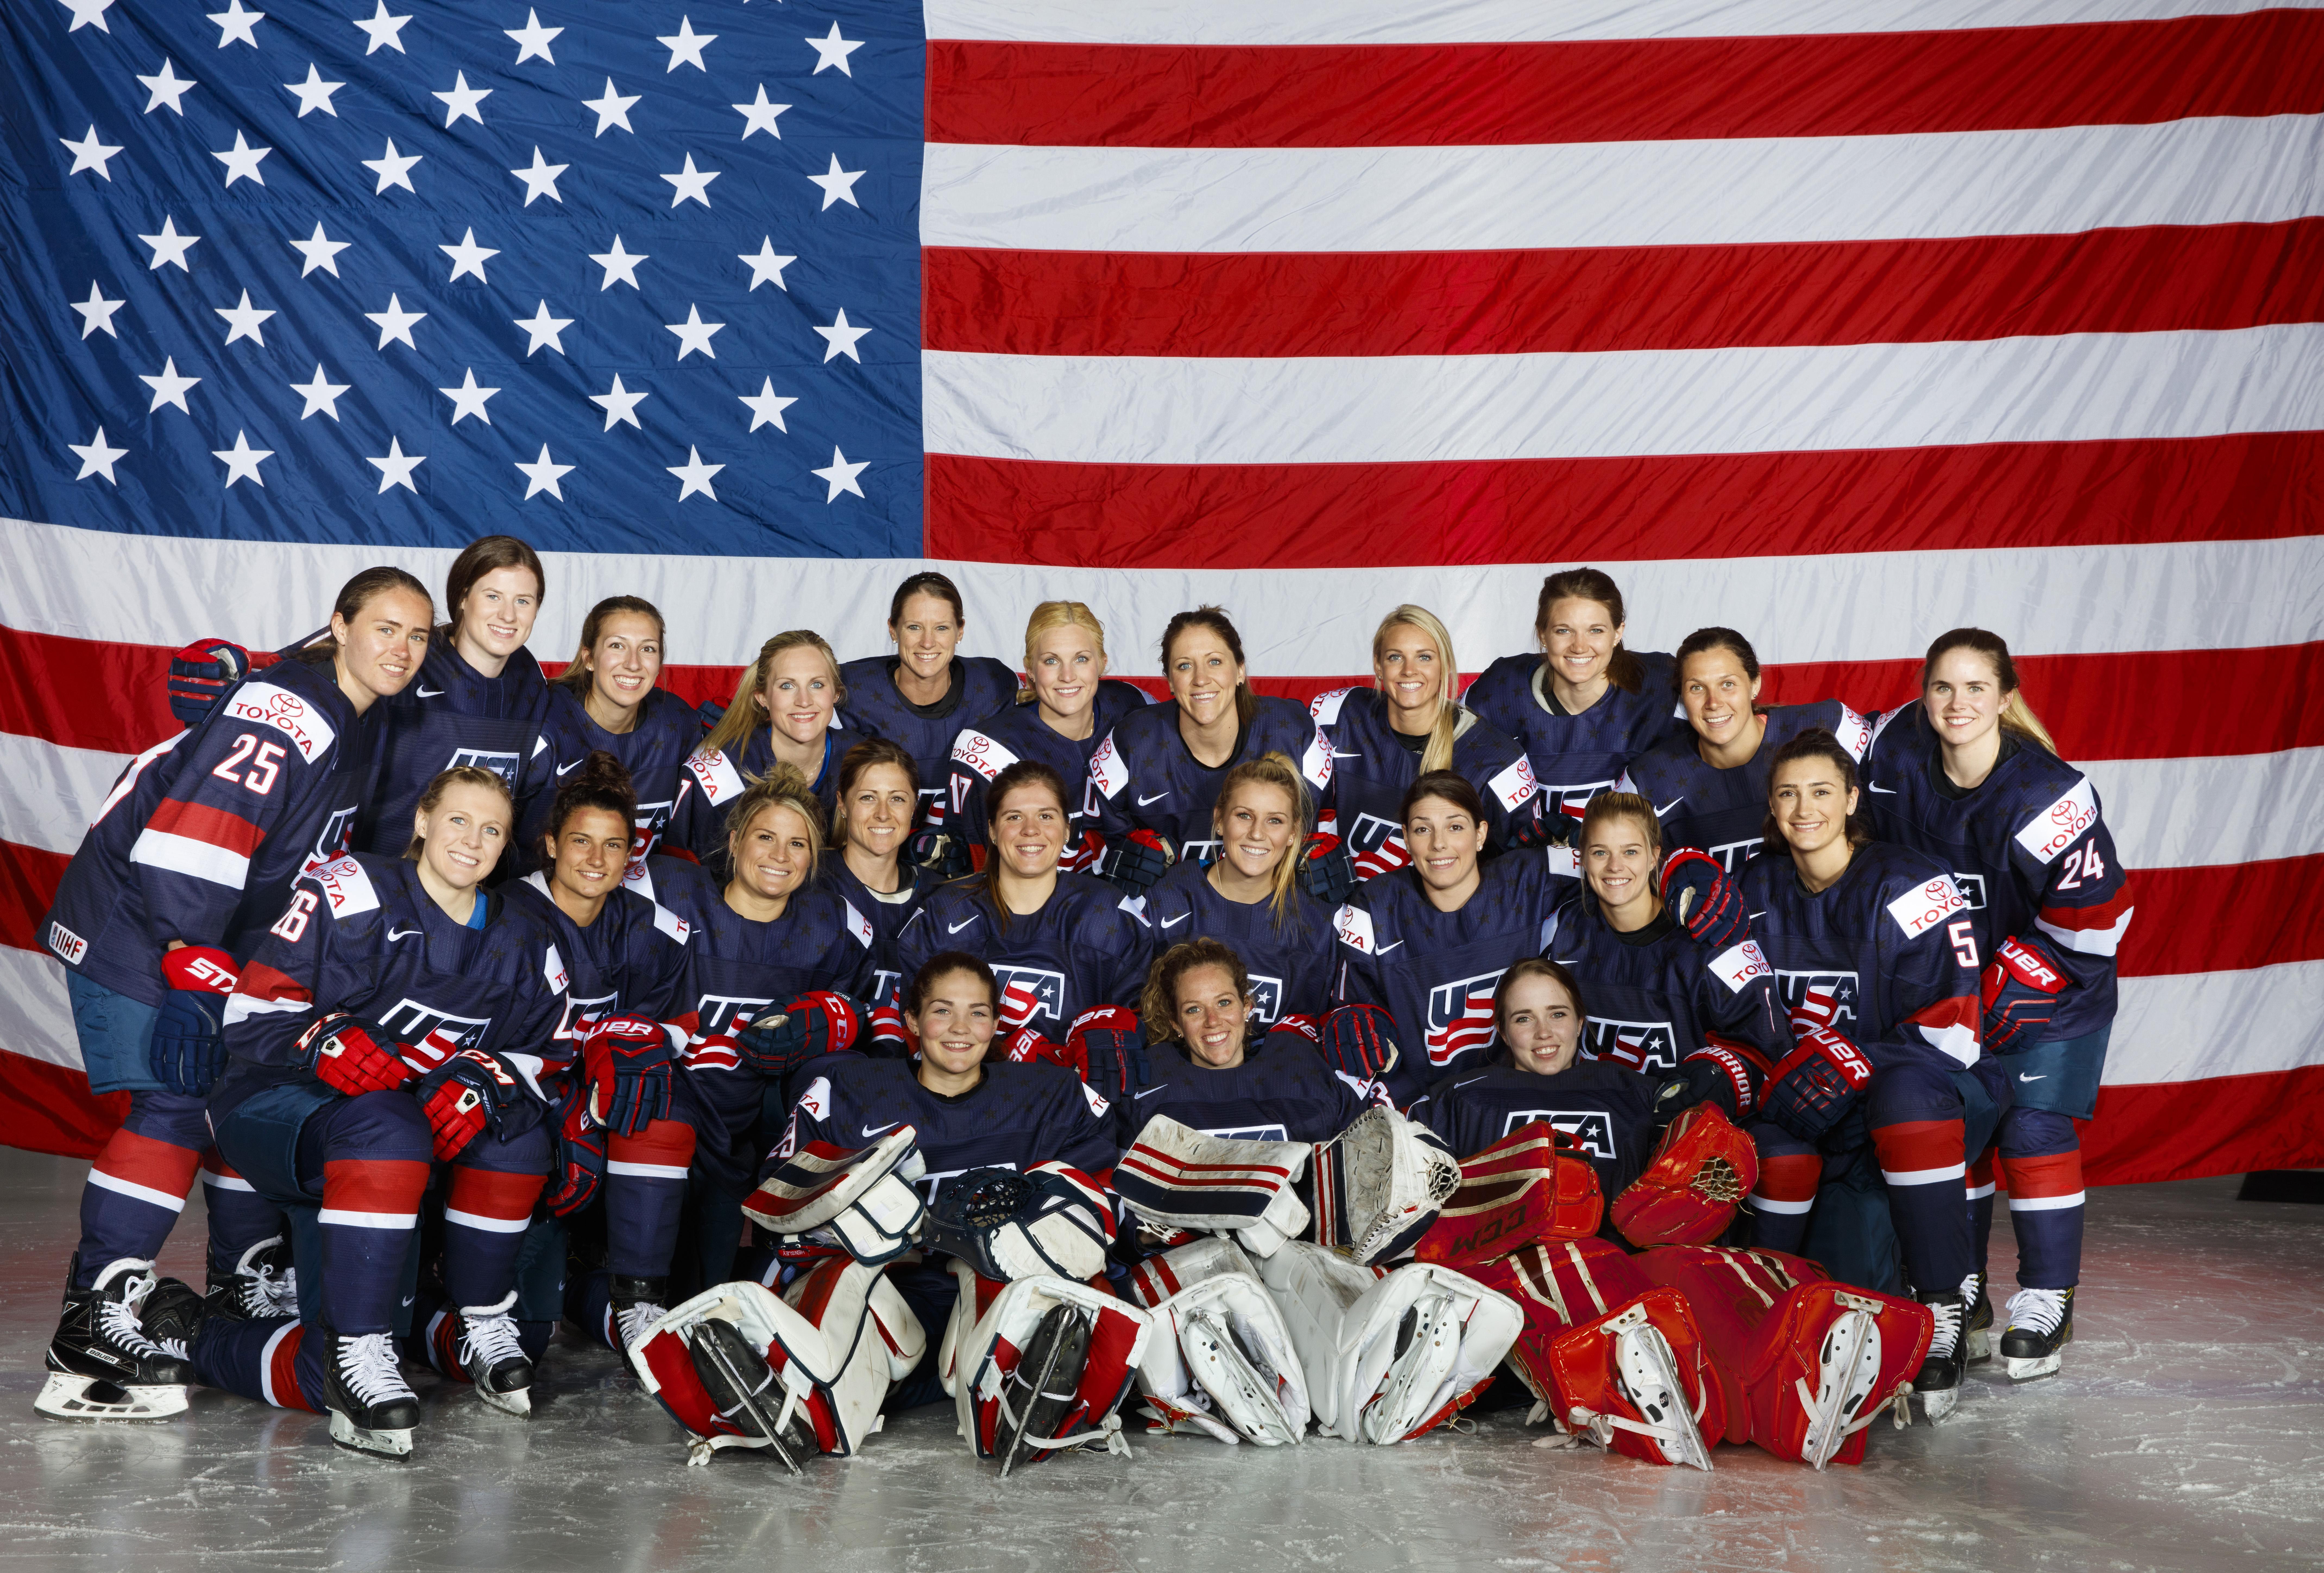 hockey teams march - HD8558×5792